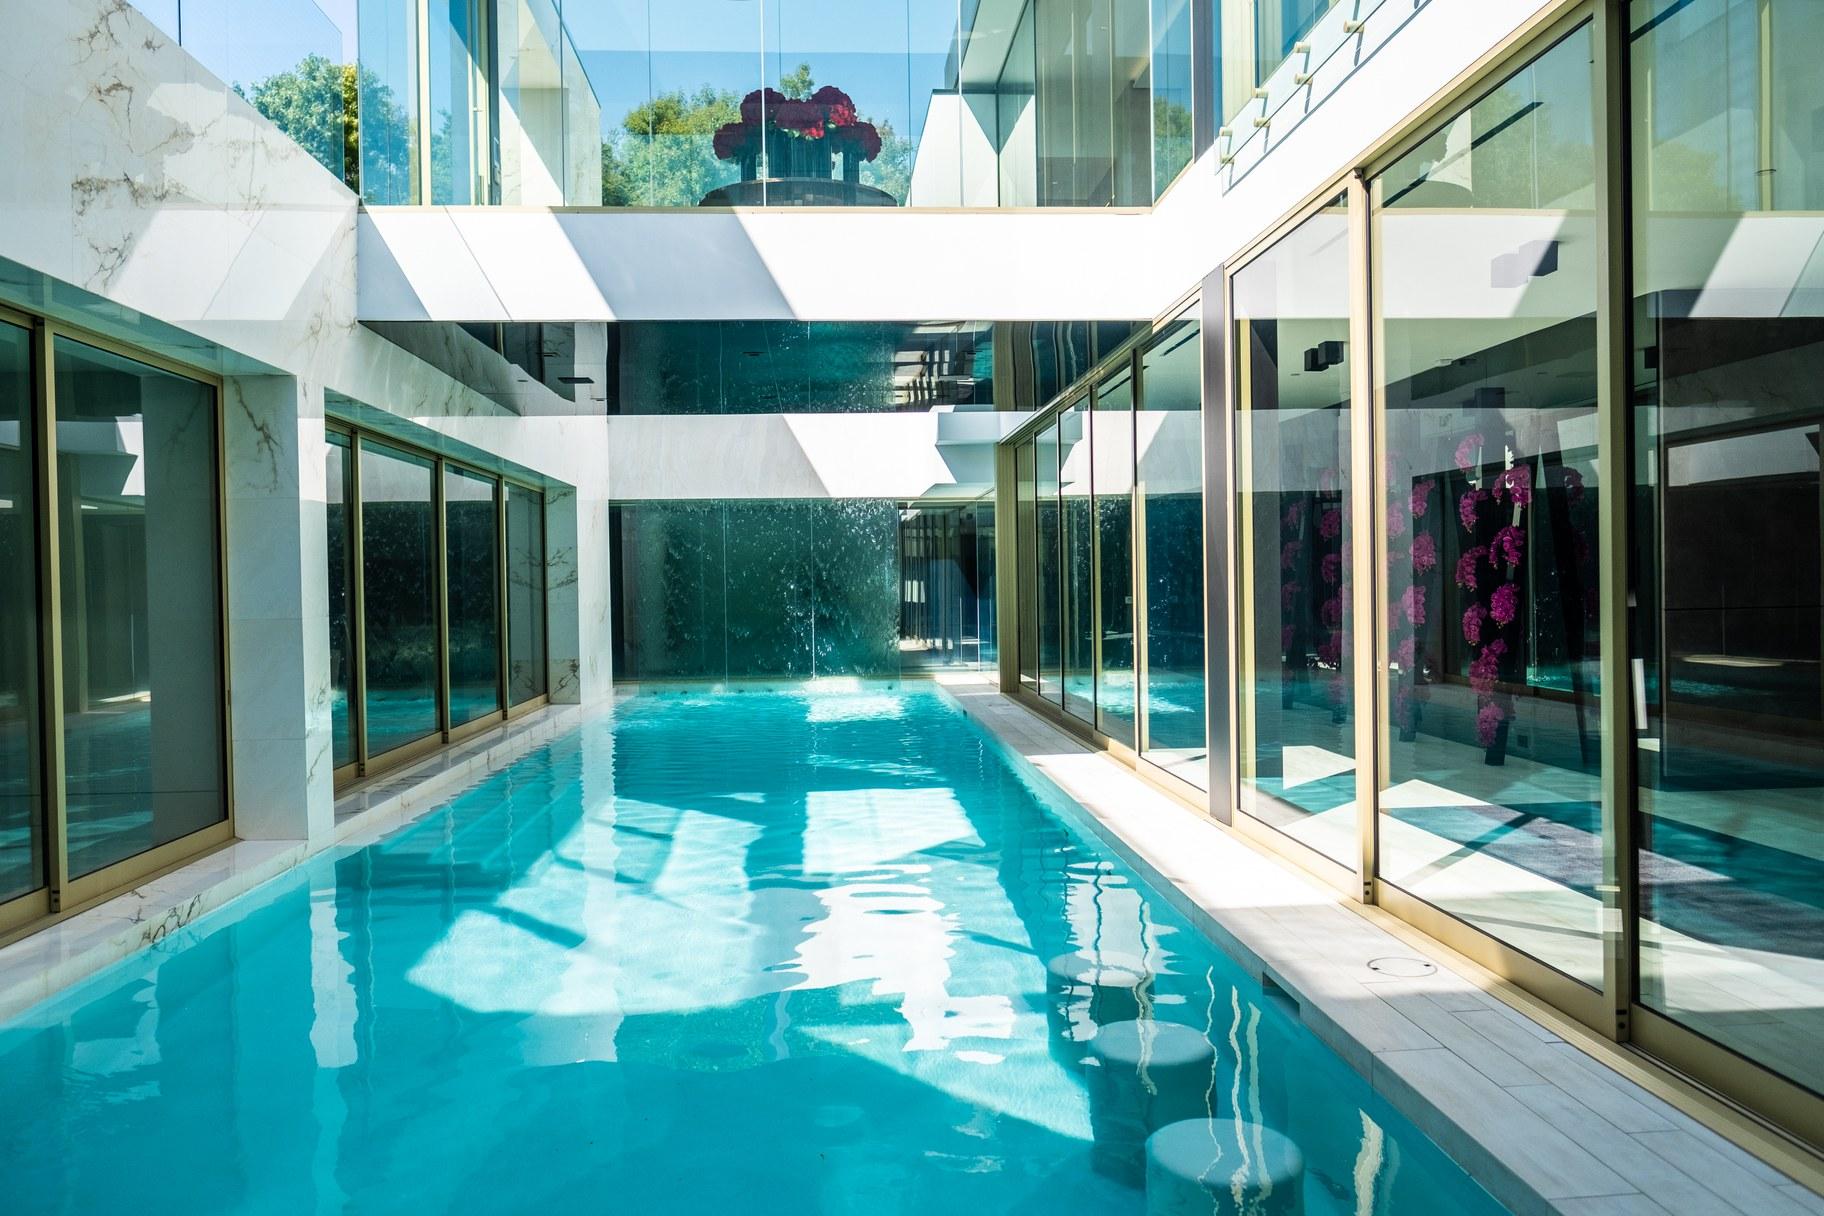 Giga mansion_pool 3_ATa.jpg